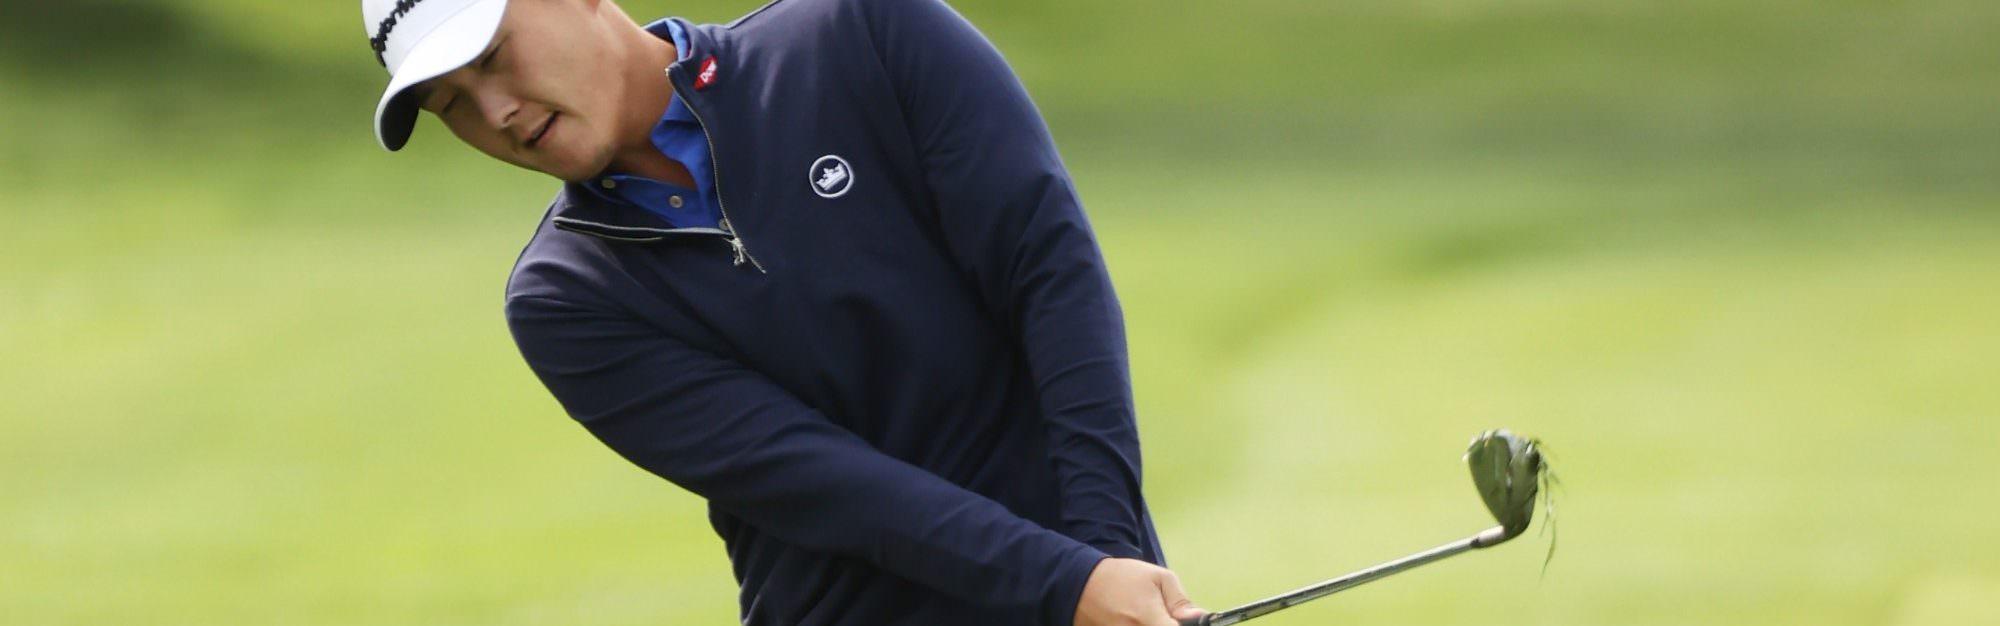 How Lee's US Open ended in bizarre six-putt meltdown